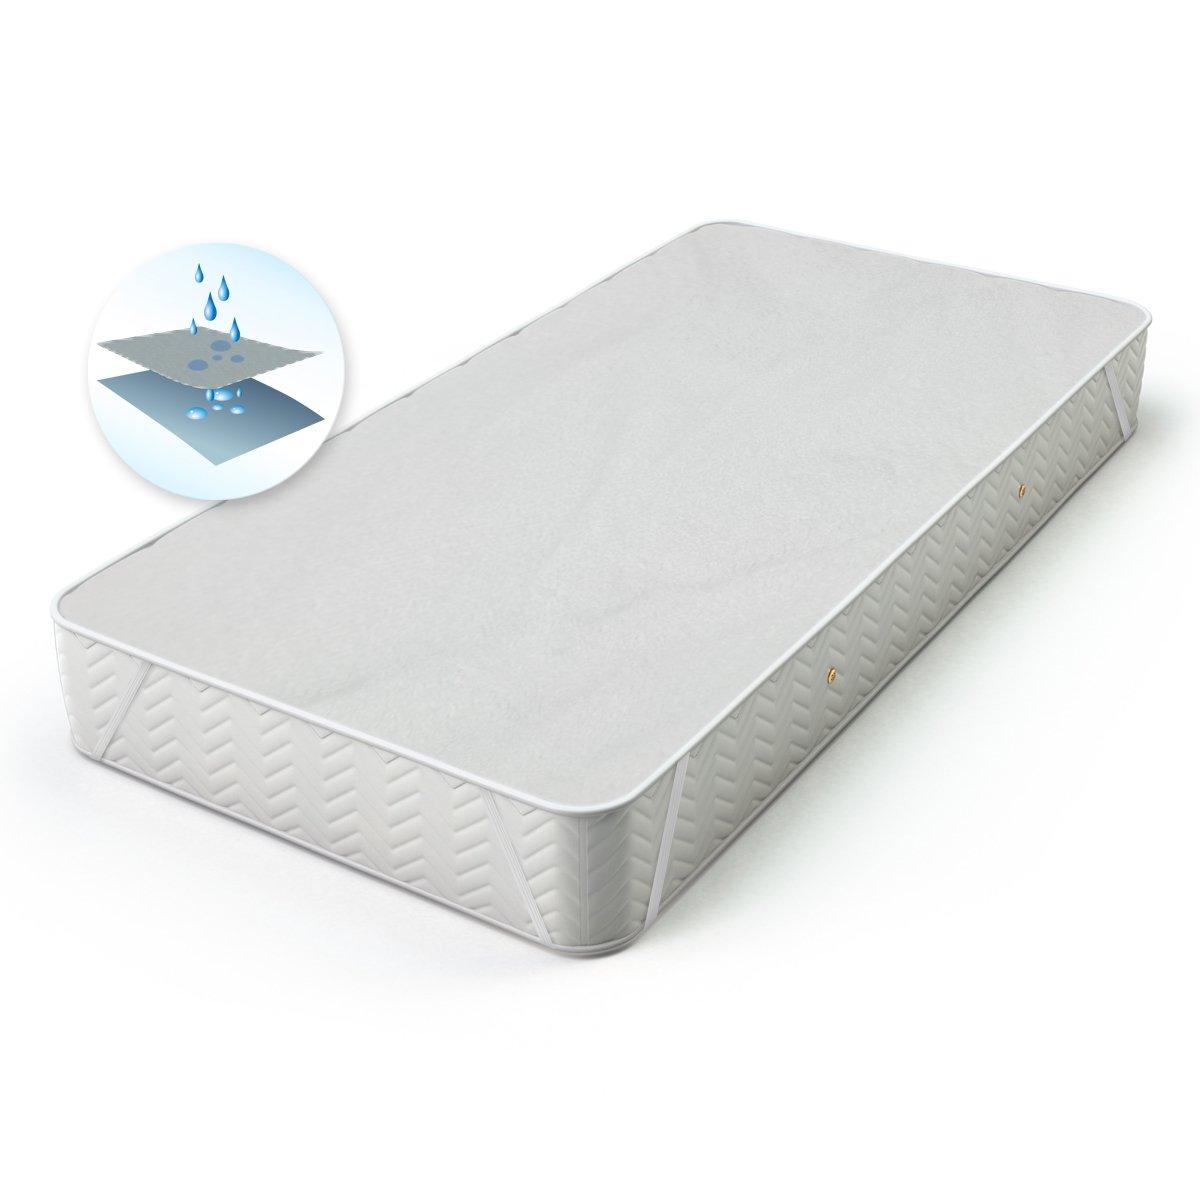 ECD-Germany Mattress Protection Waterproof 70x140 cm Washable with Corner Rubs Washable 95° C 100% Cotton ECD Germany